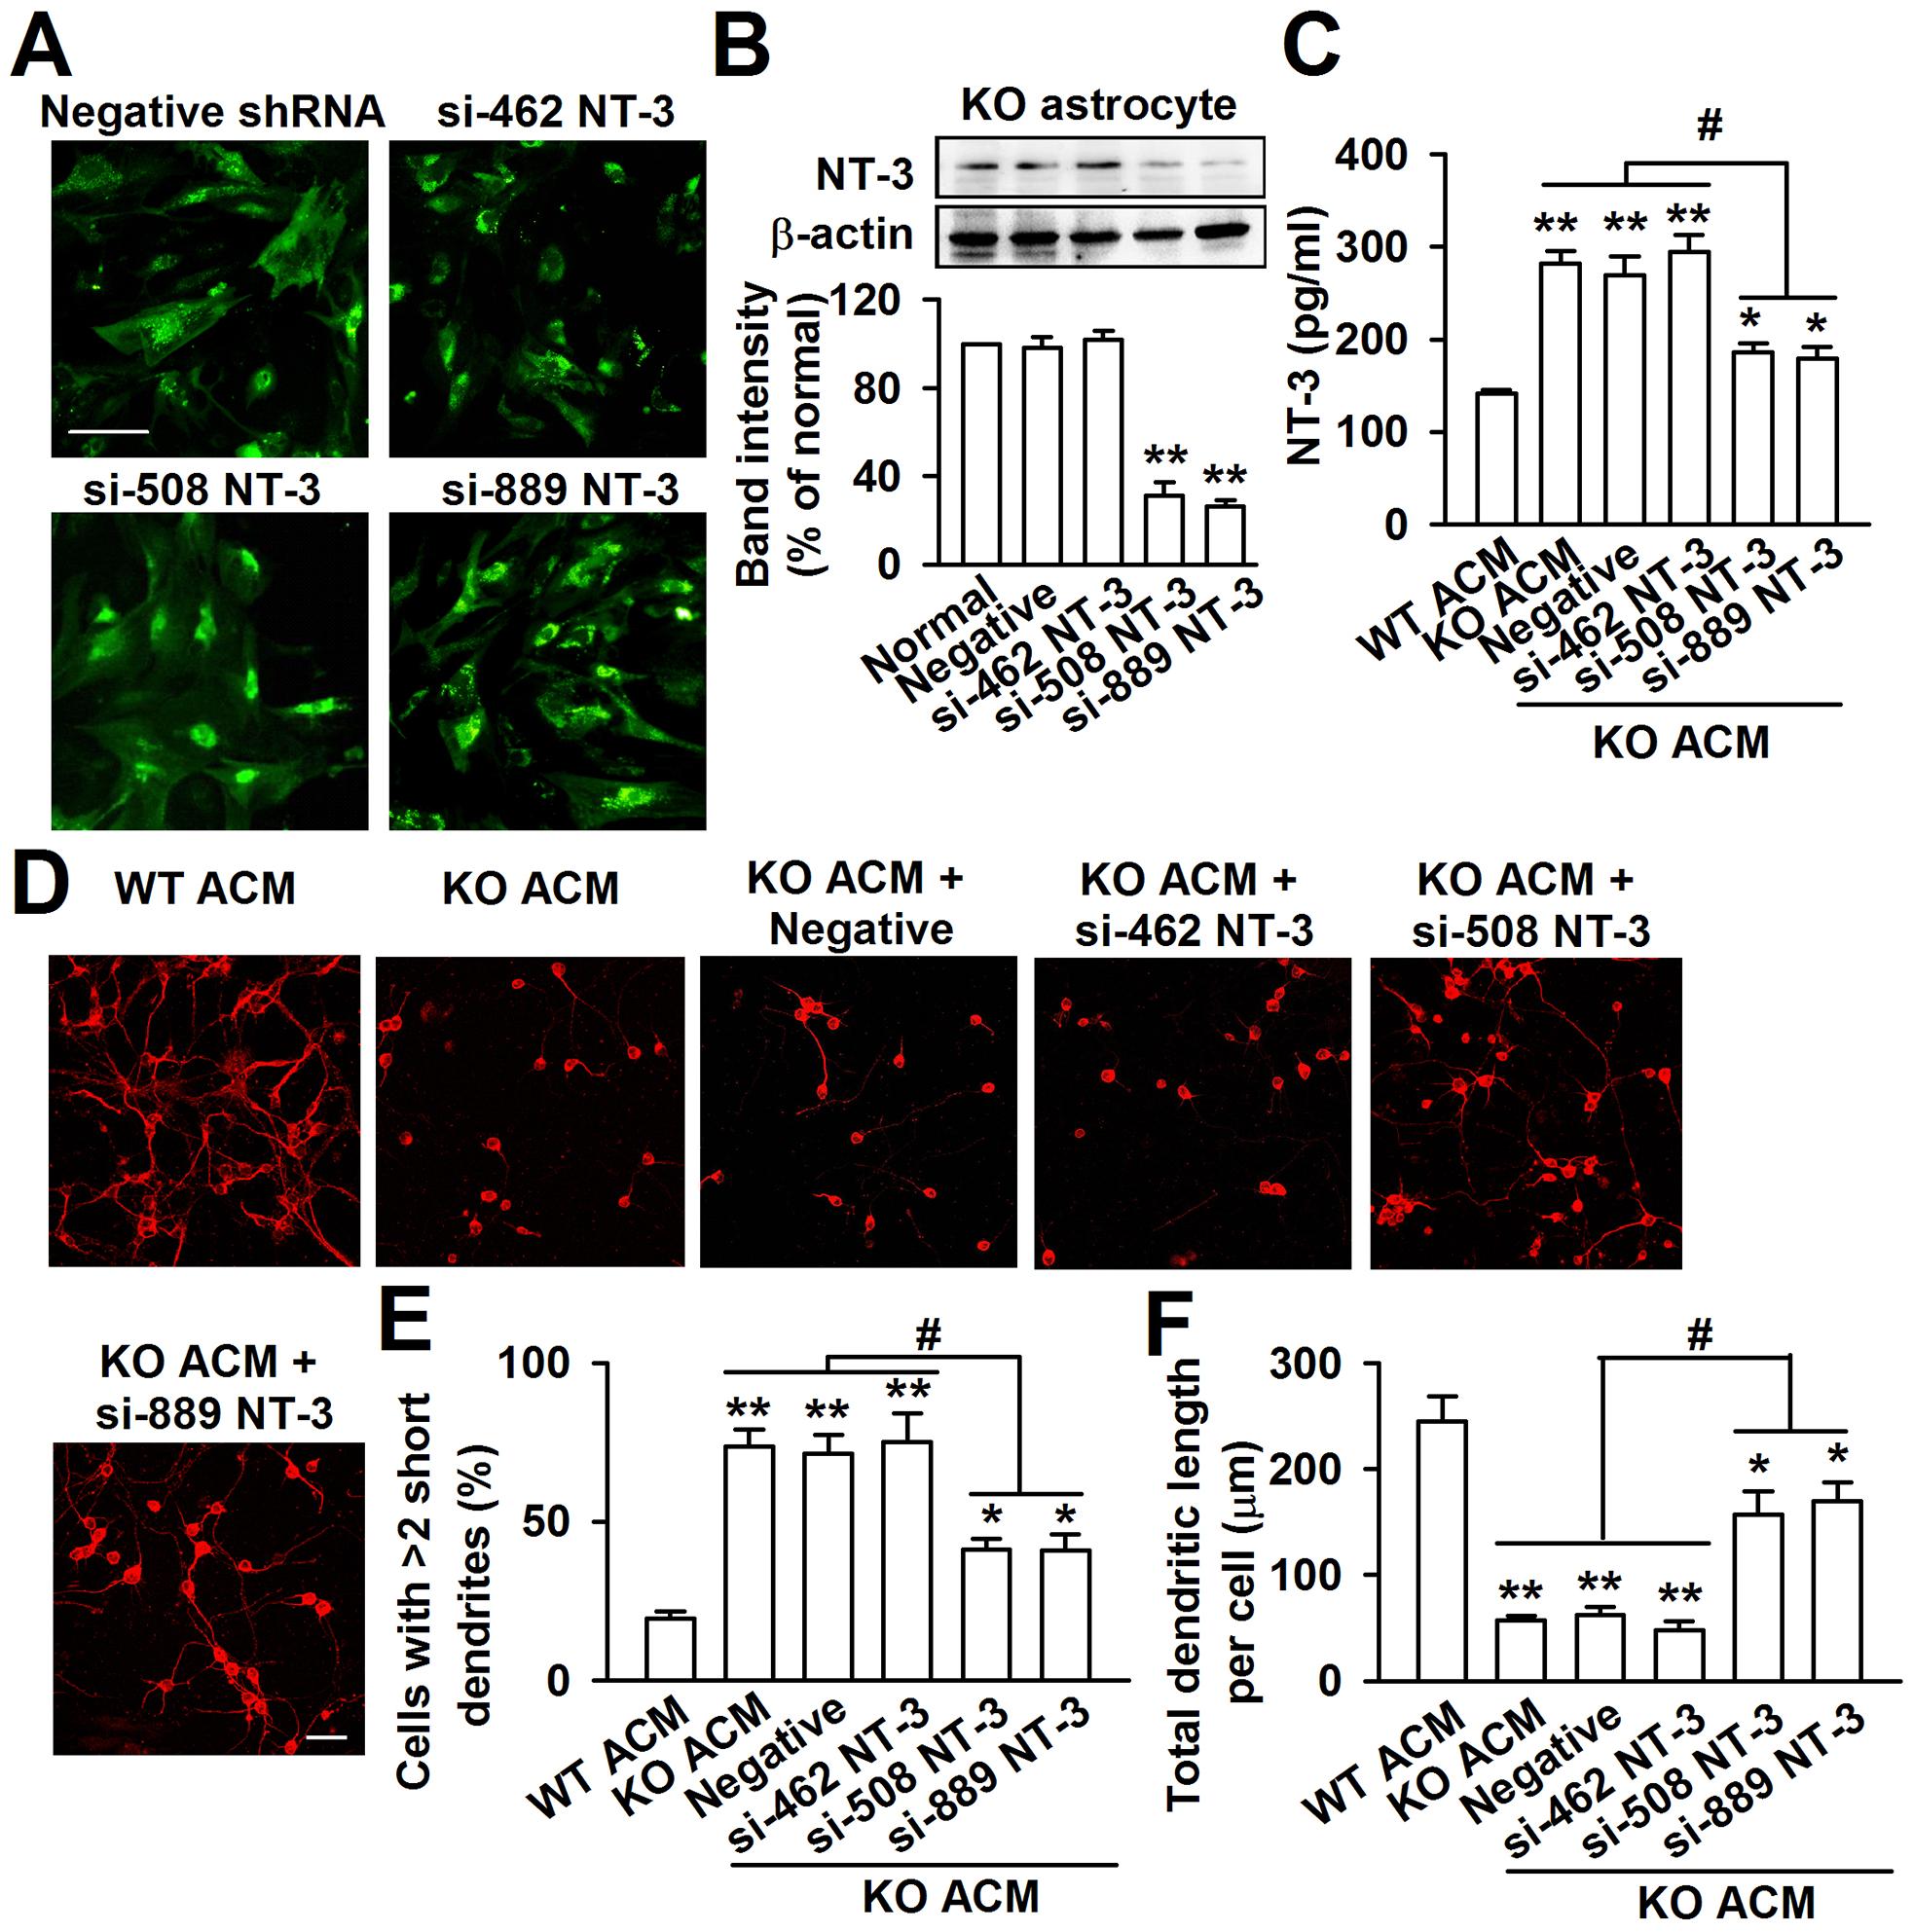 Knockdown of NT-3 in <i>Fmr1</i> KO astrocytes rescued aberrant neuronal morphology.